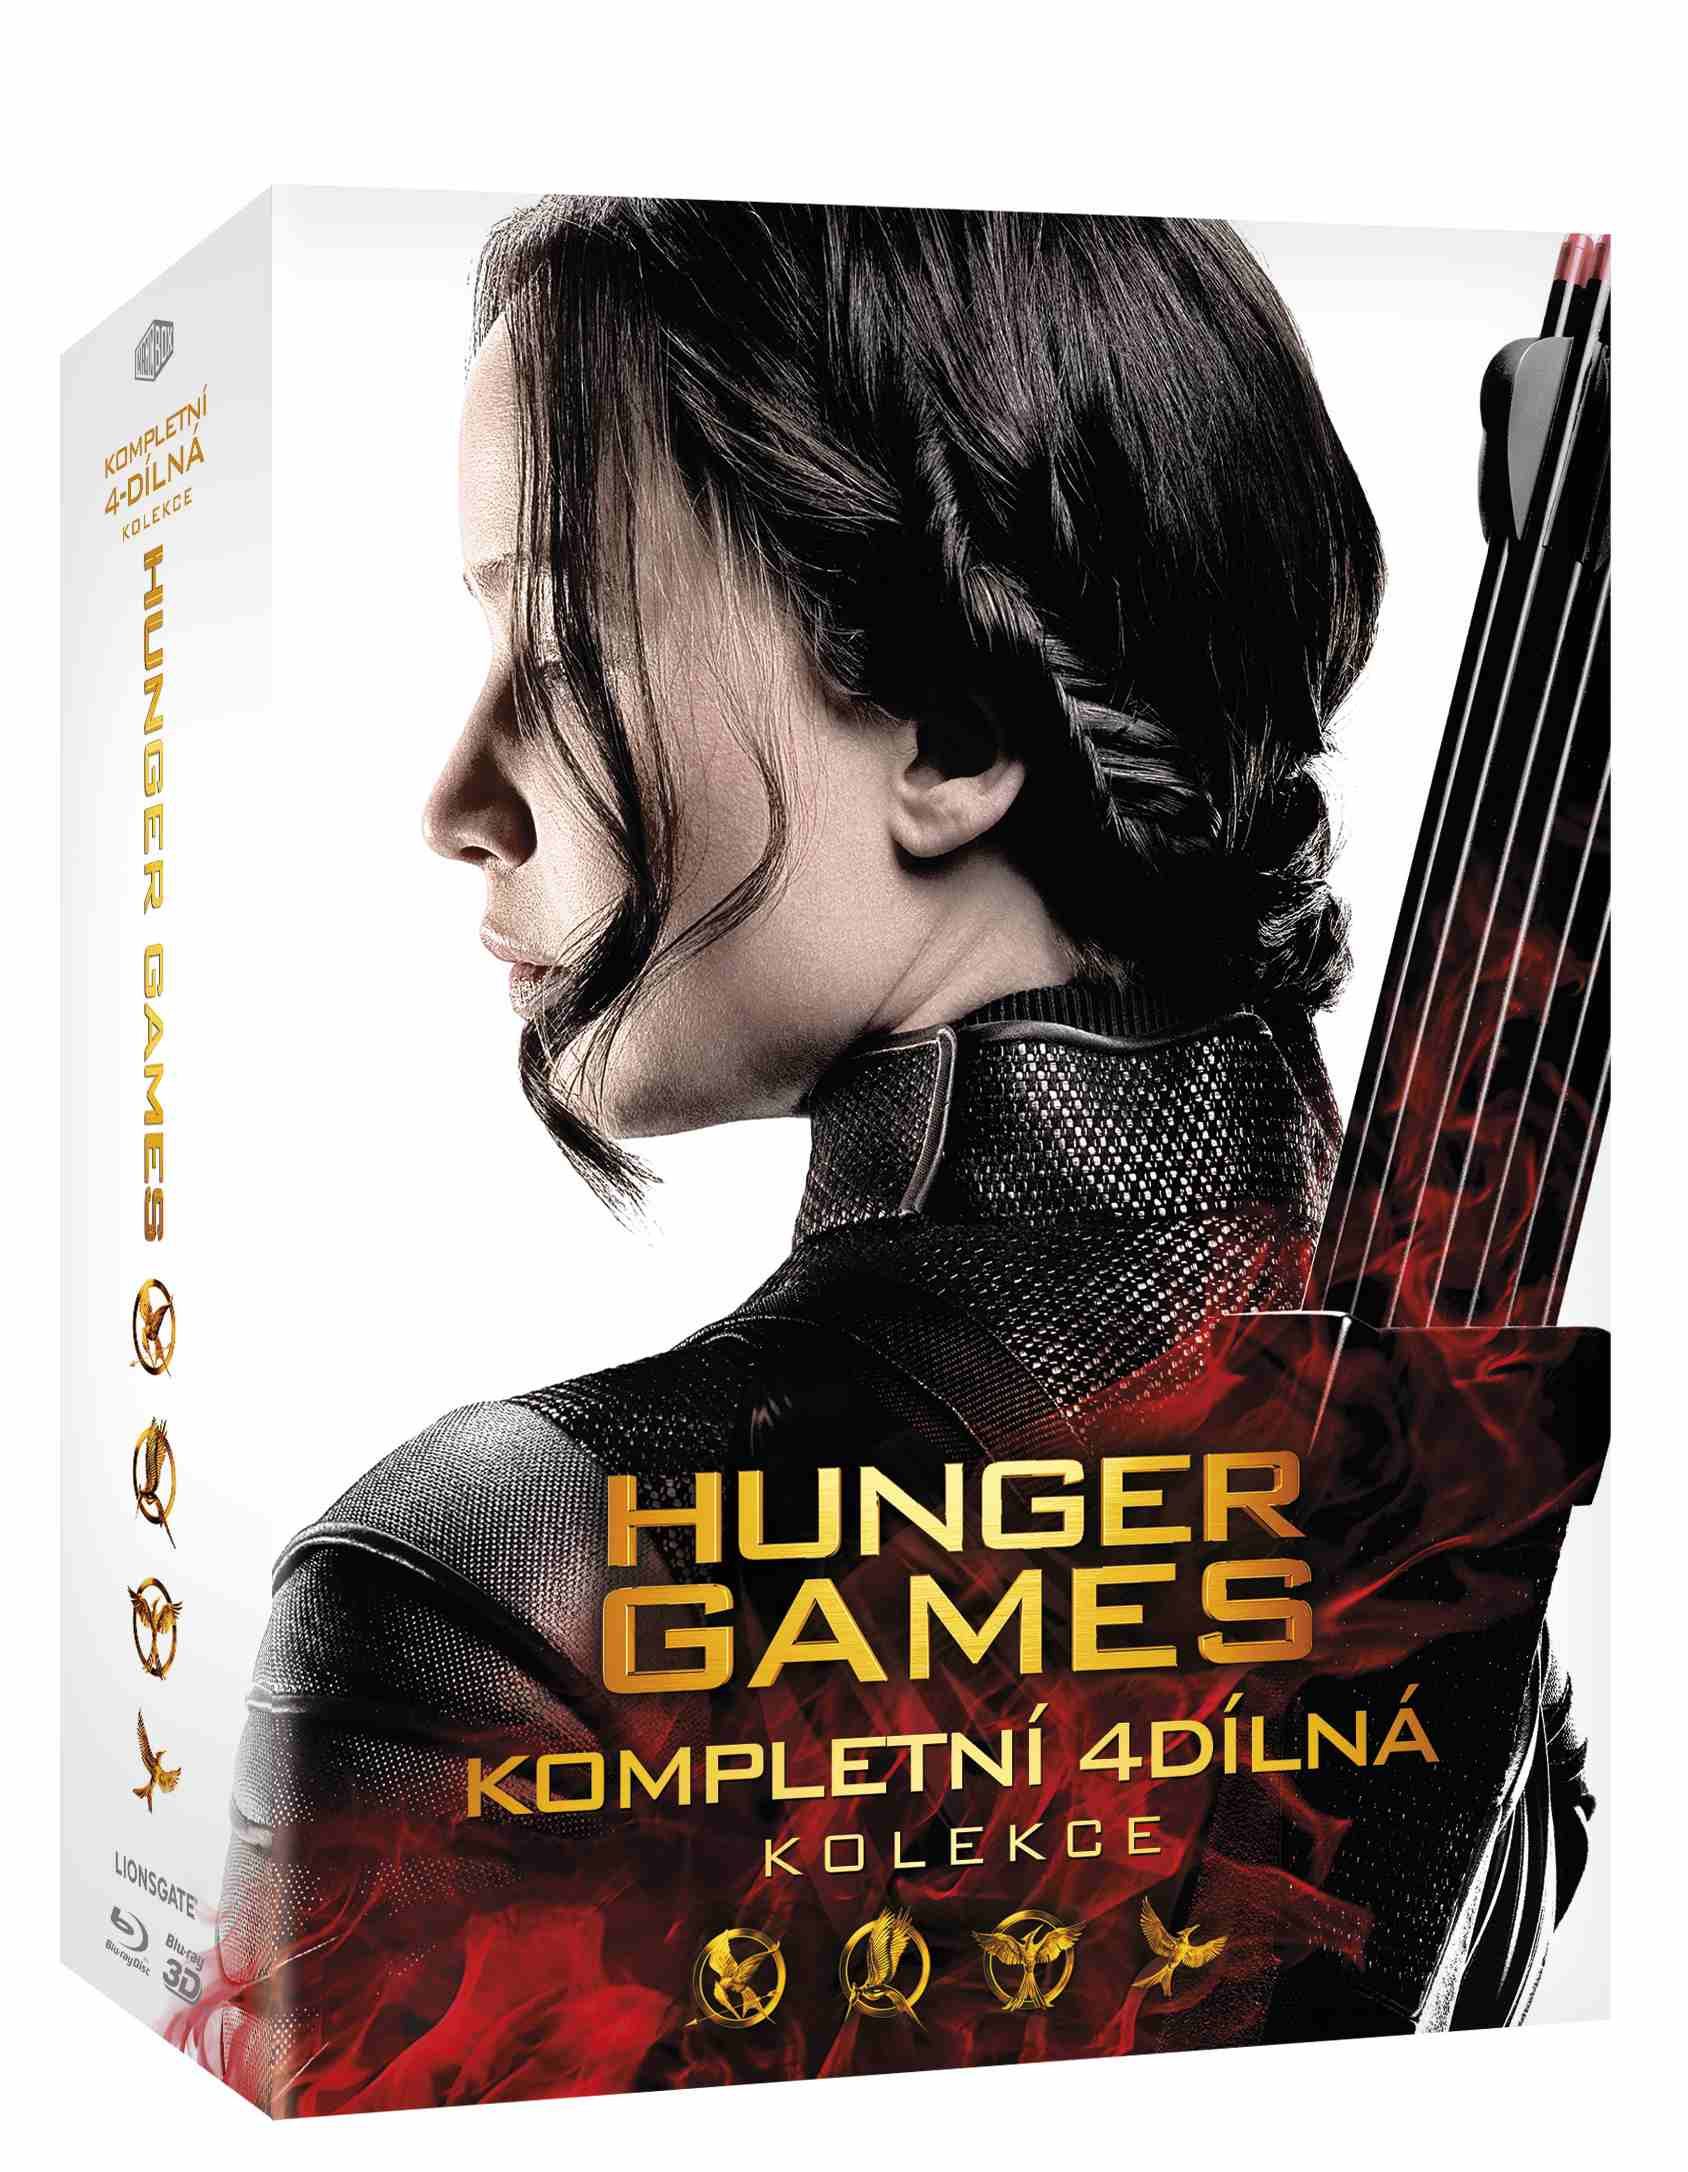 HUNGER GAMES 1-4 KOLEKCE (5 BD) - Blu-ray